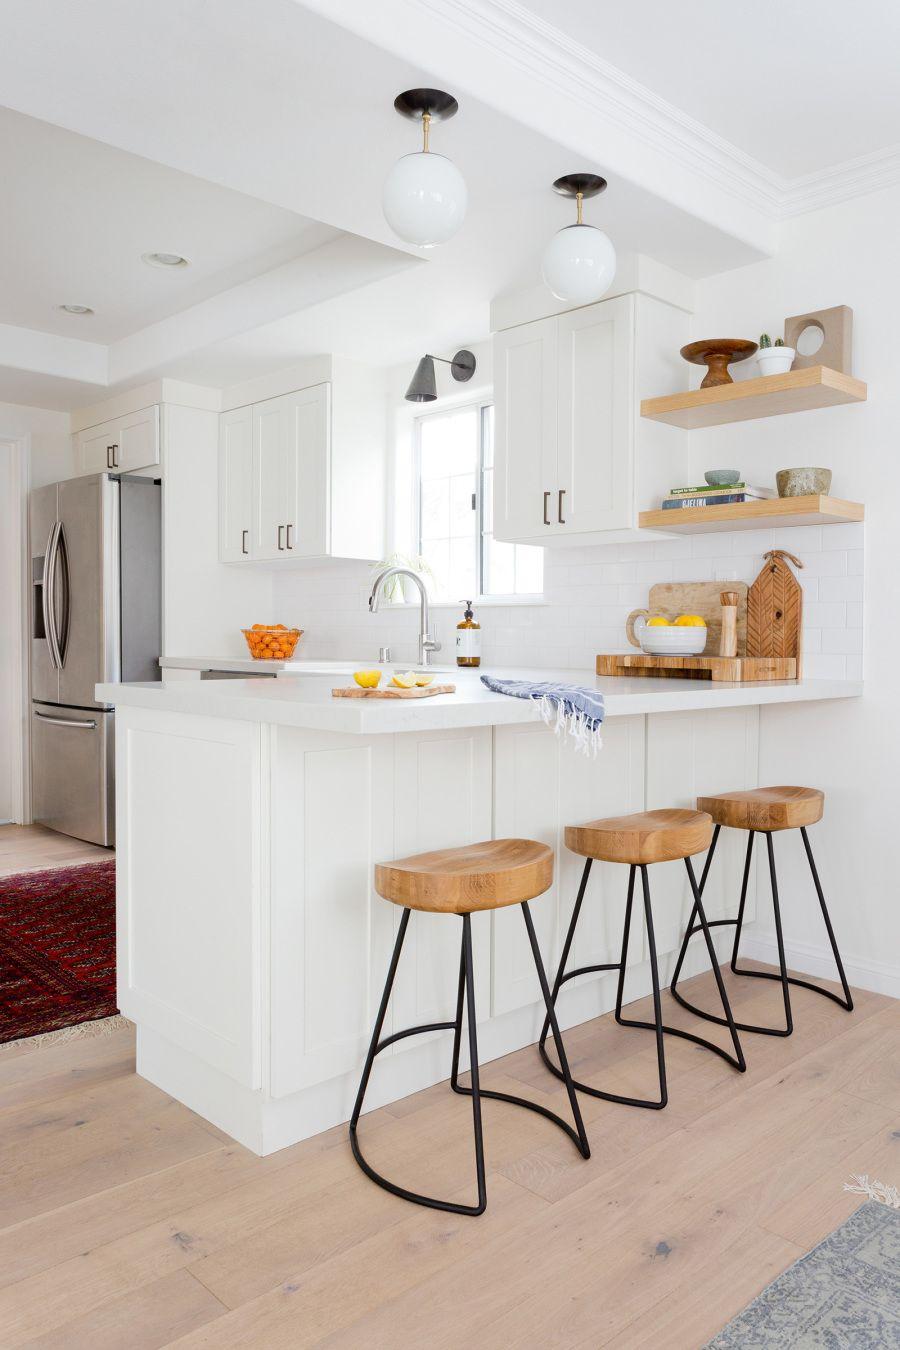 Merveilleux Boho Kitchen Decor: Photography: Amy Bartlam   Http://www.amybartlam.com/